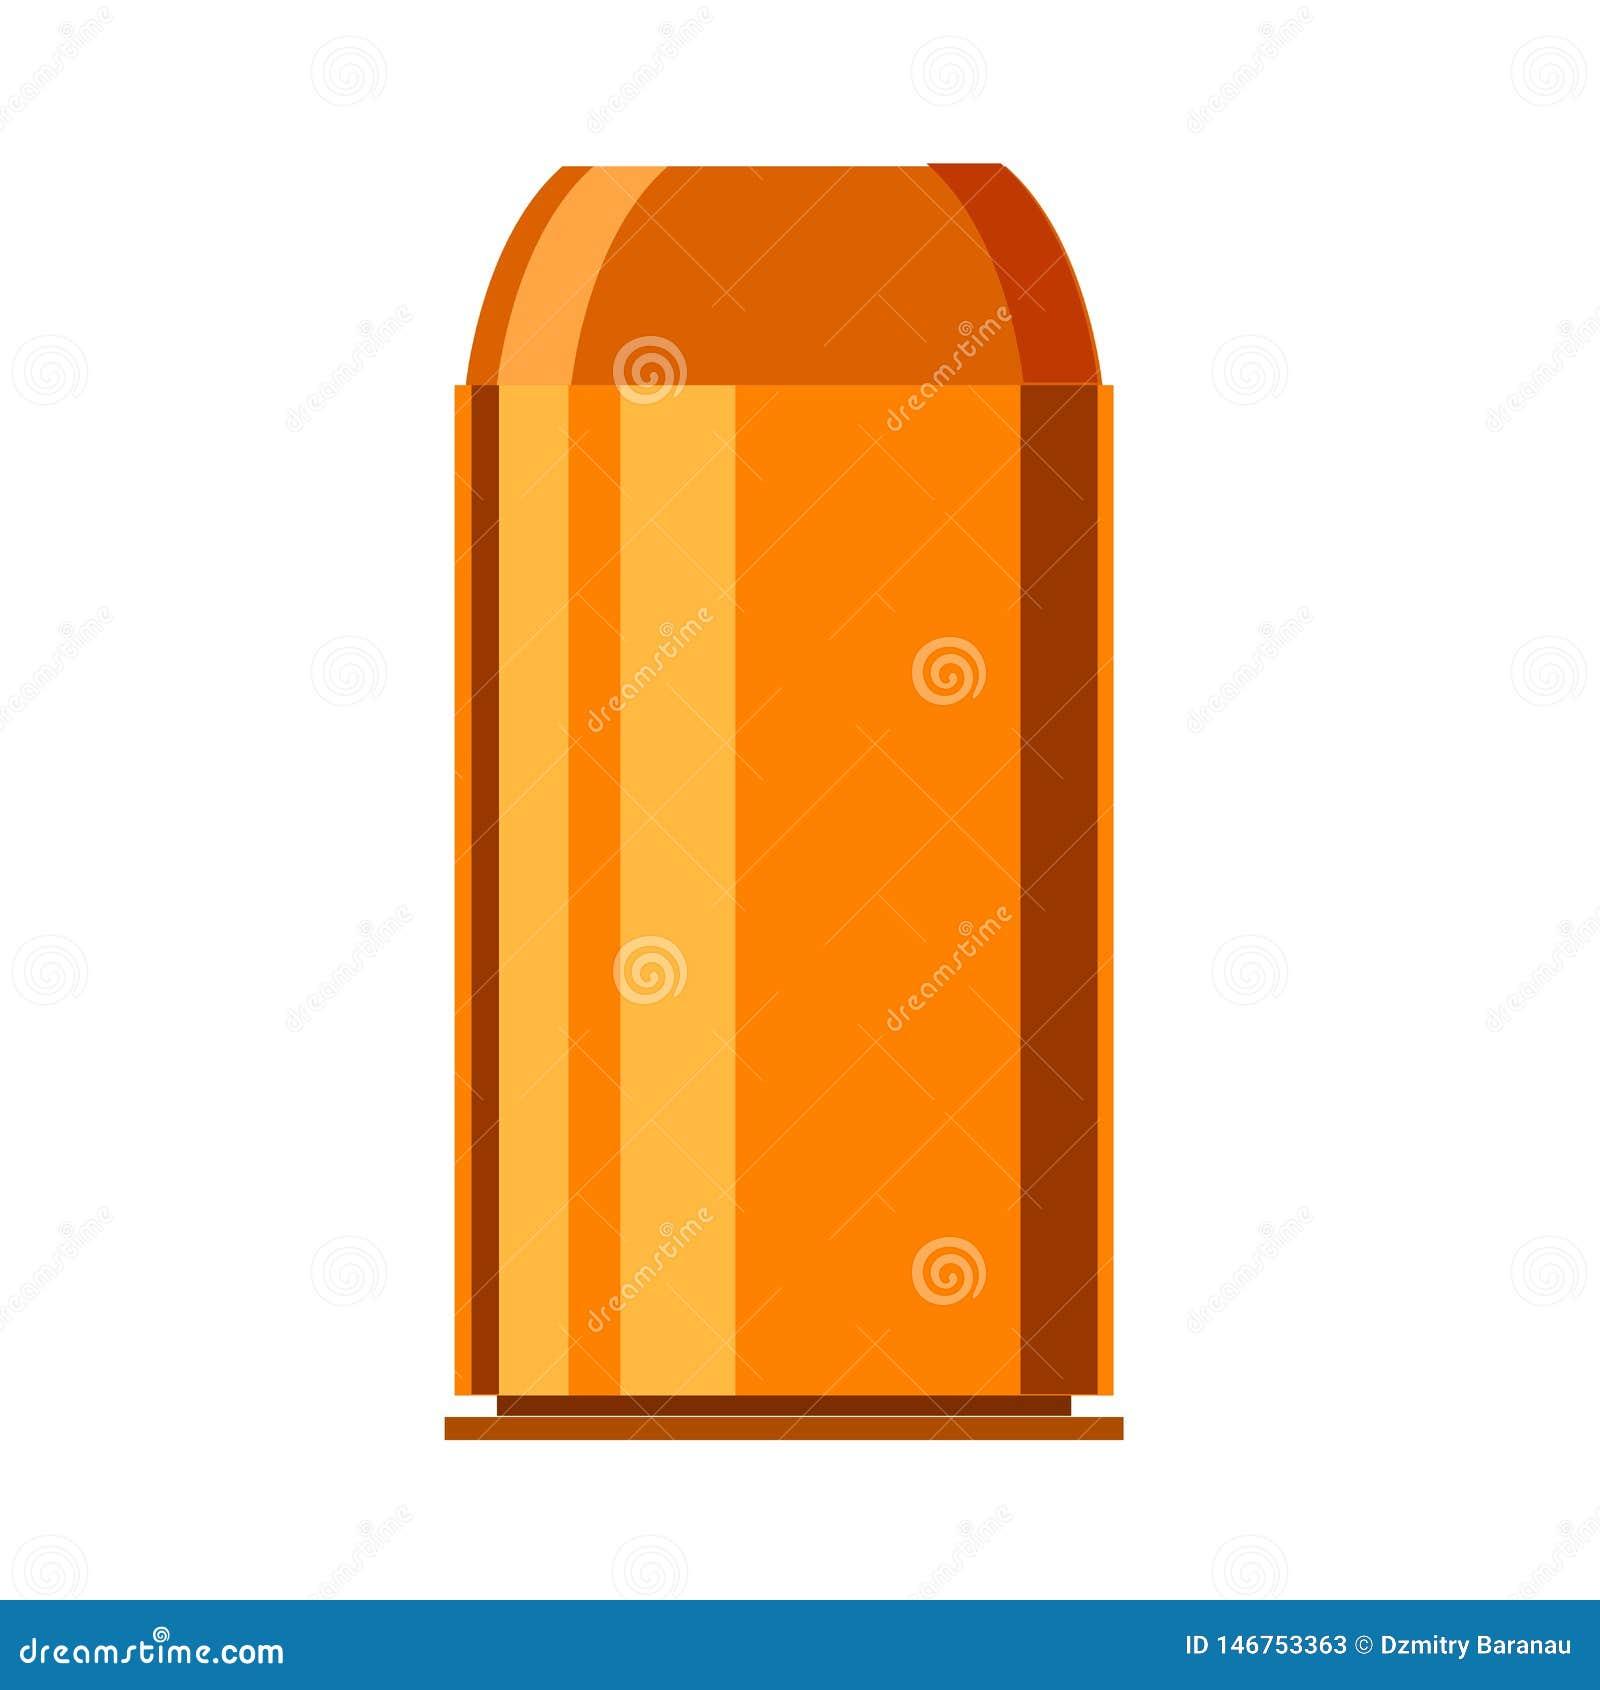 Bullet ammunition illustration object defense. Vector copper power ammo flat icon